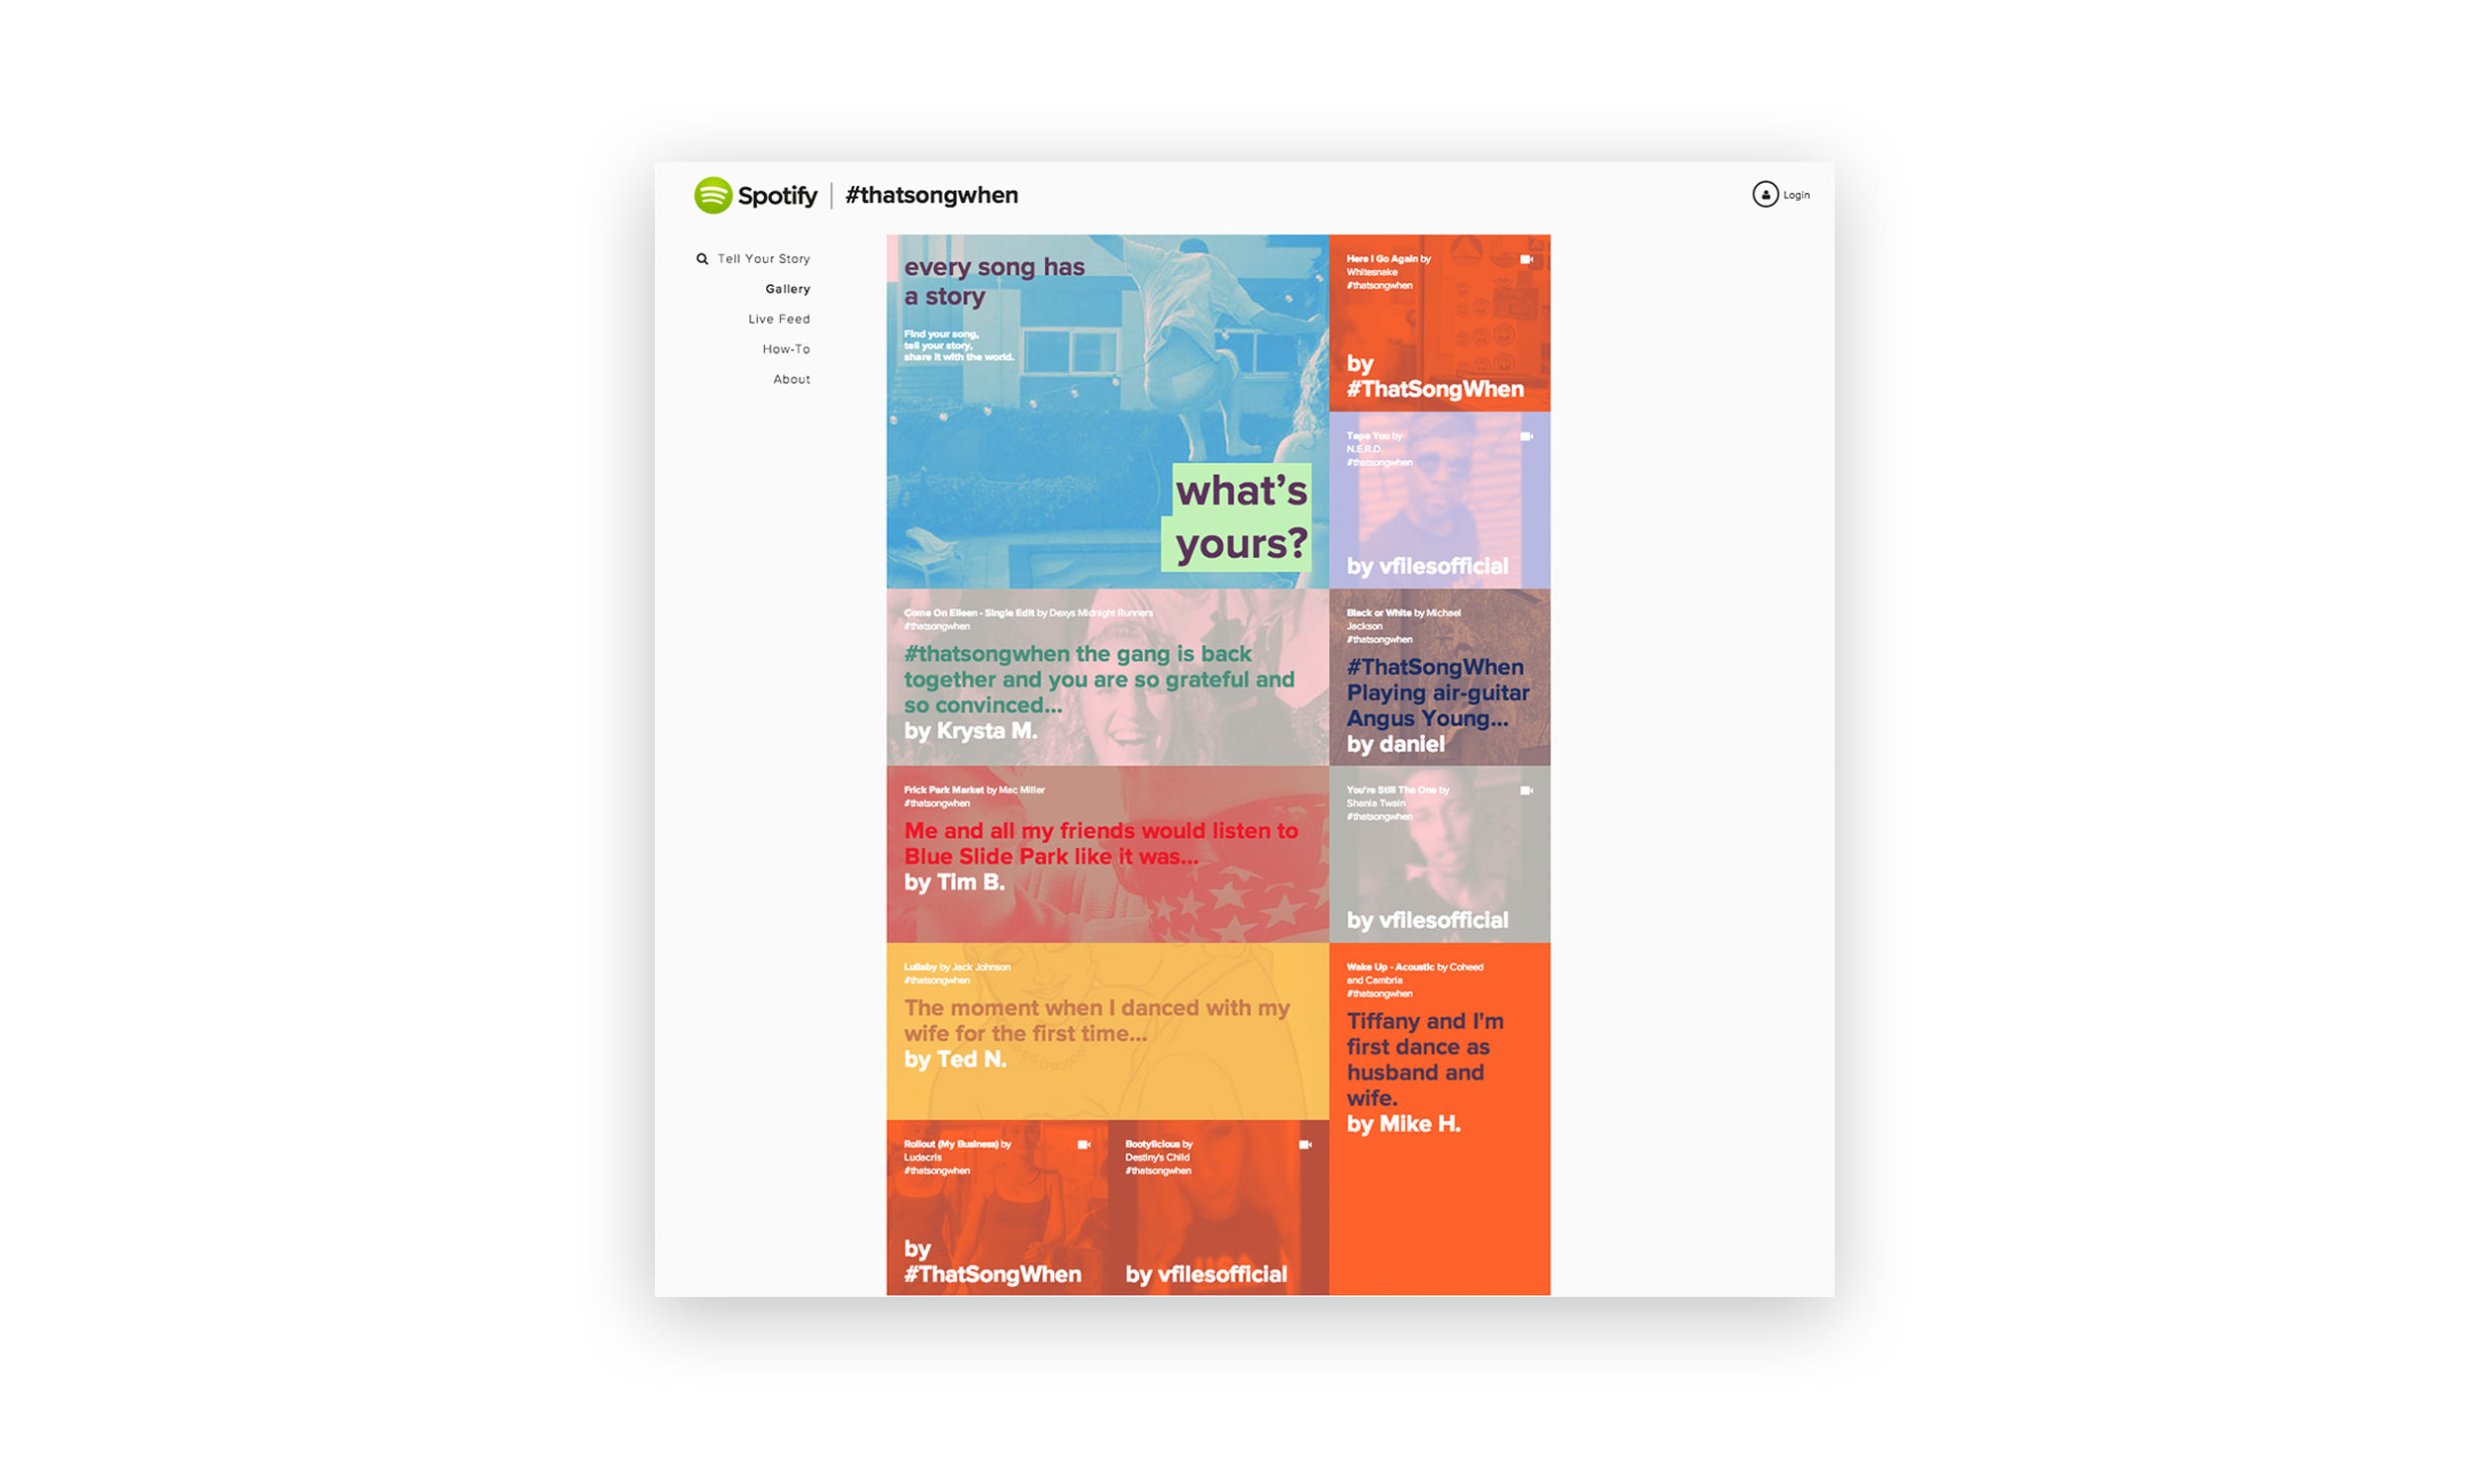 Spotify-thatsongwhen-screens1.jpg